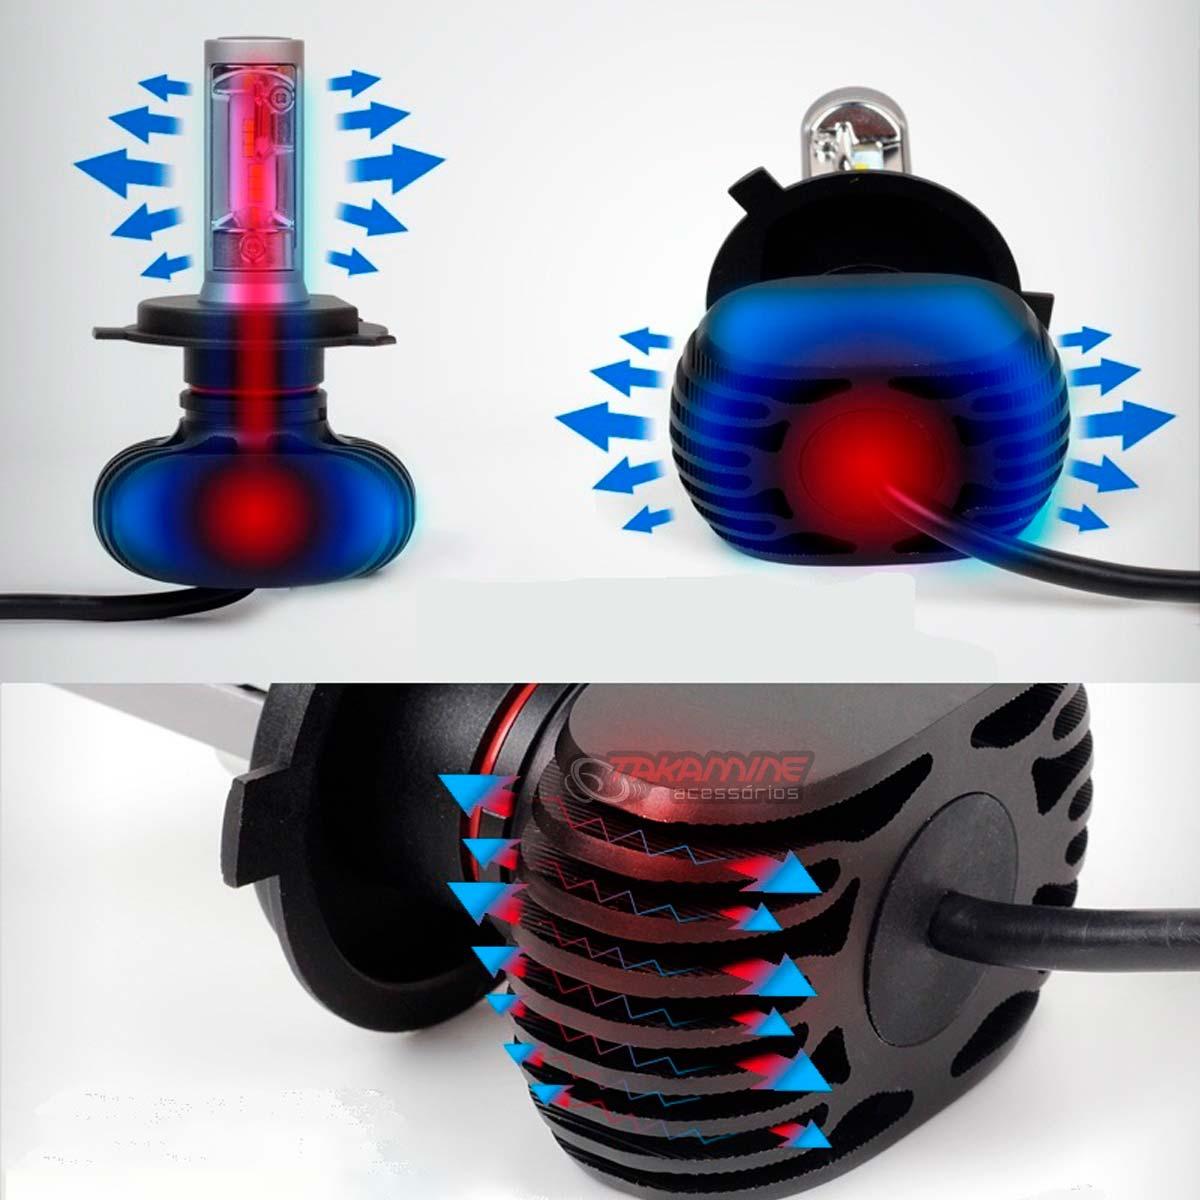 Kit Ultra LED Duster 2011 até 2019 tipo xenon farol baixo H7 50W